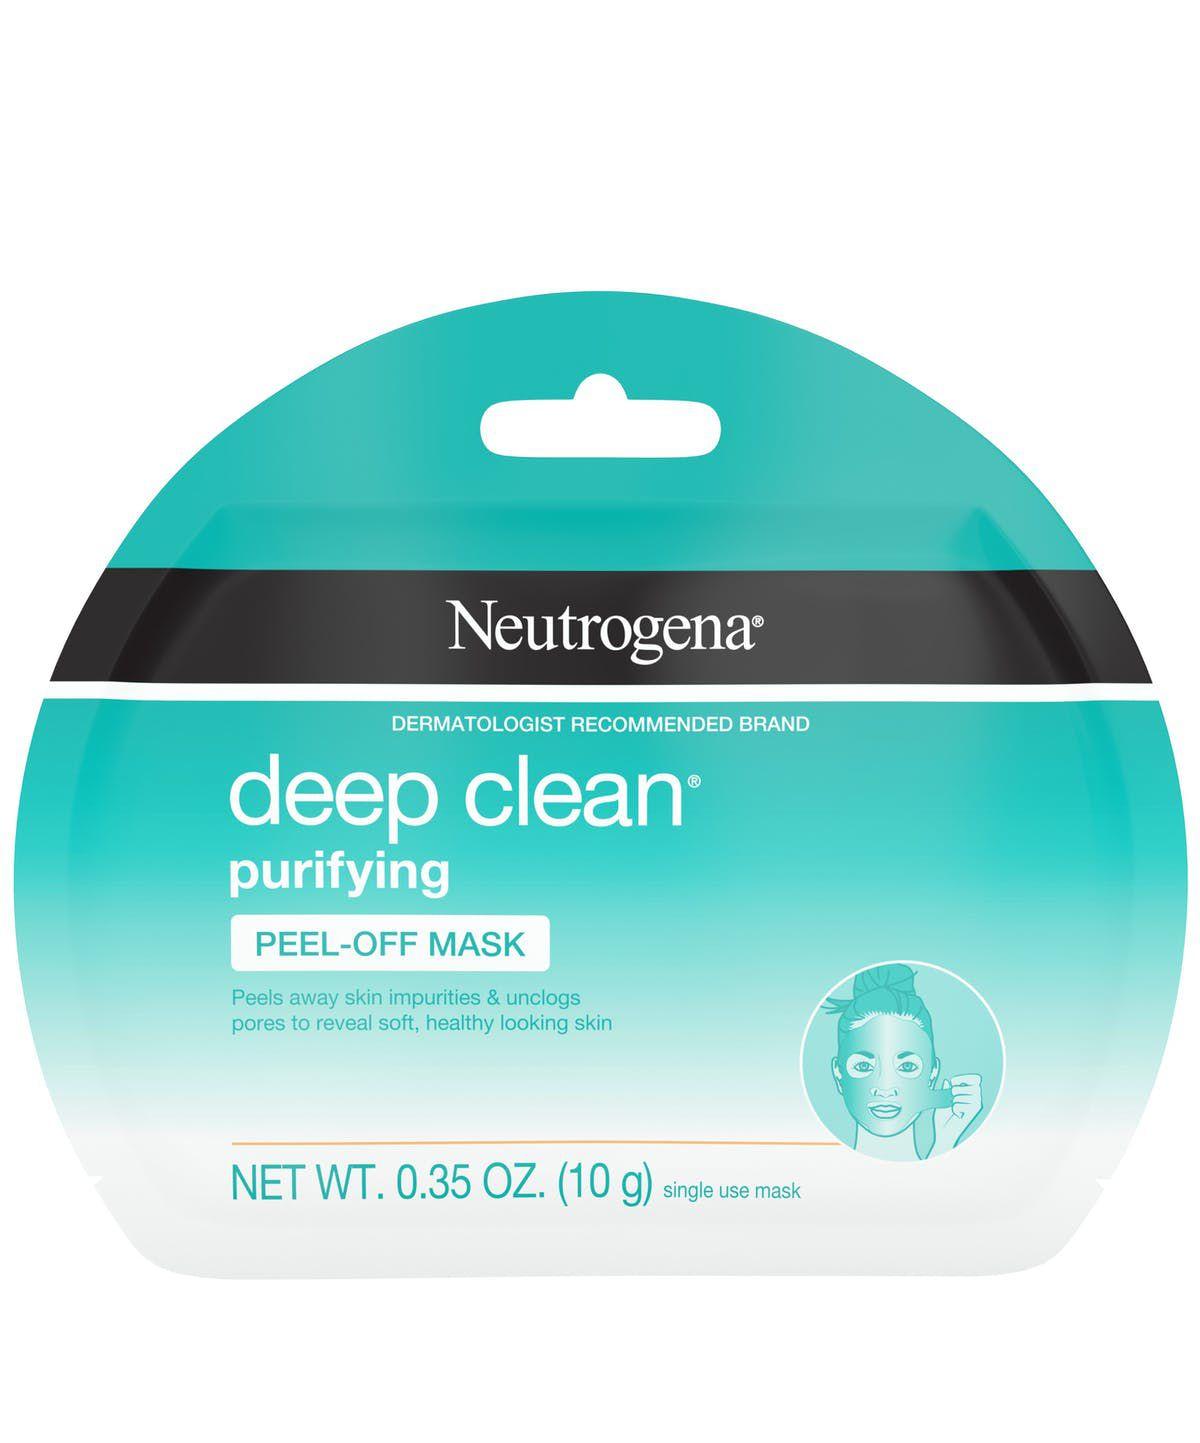 Neutrogena Deep Clean Purifying Peel-Off Face Mask